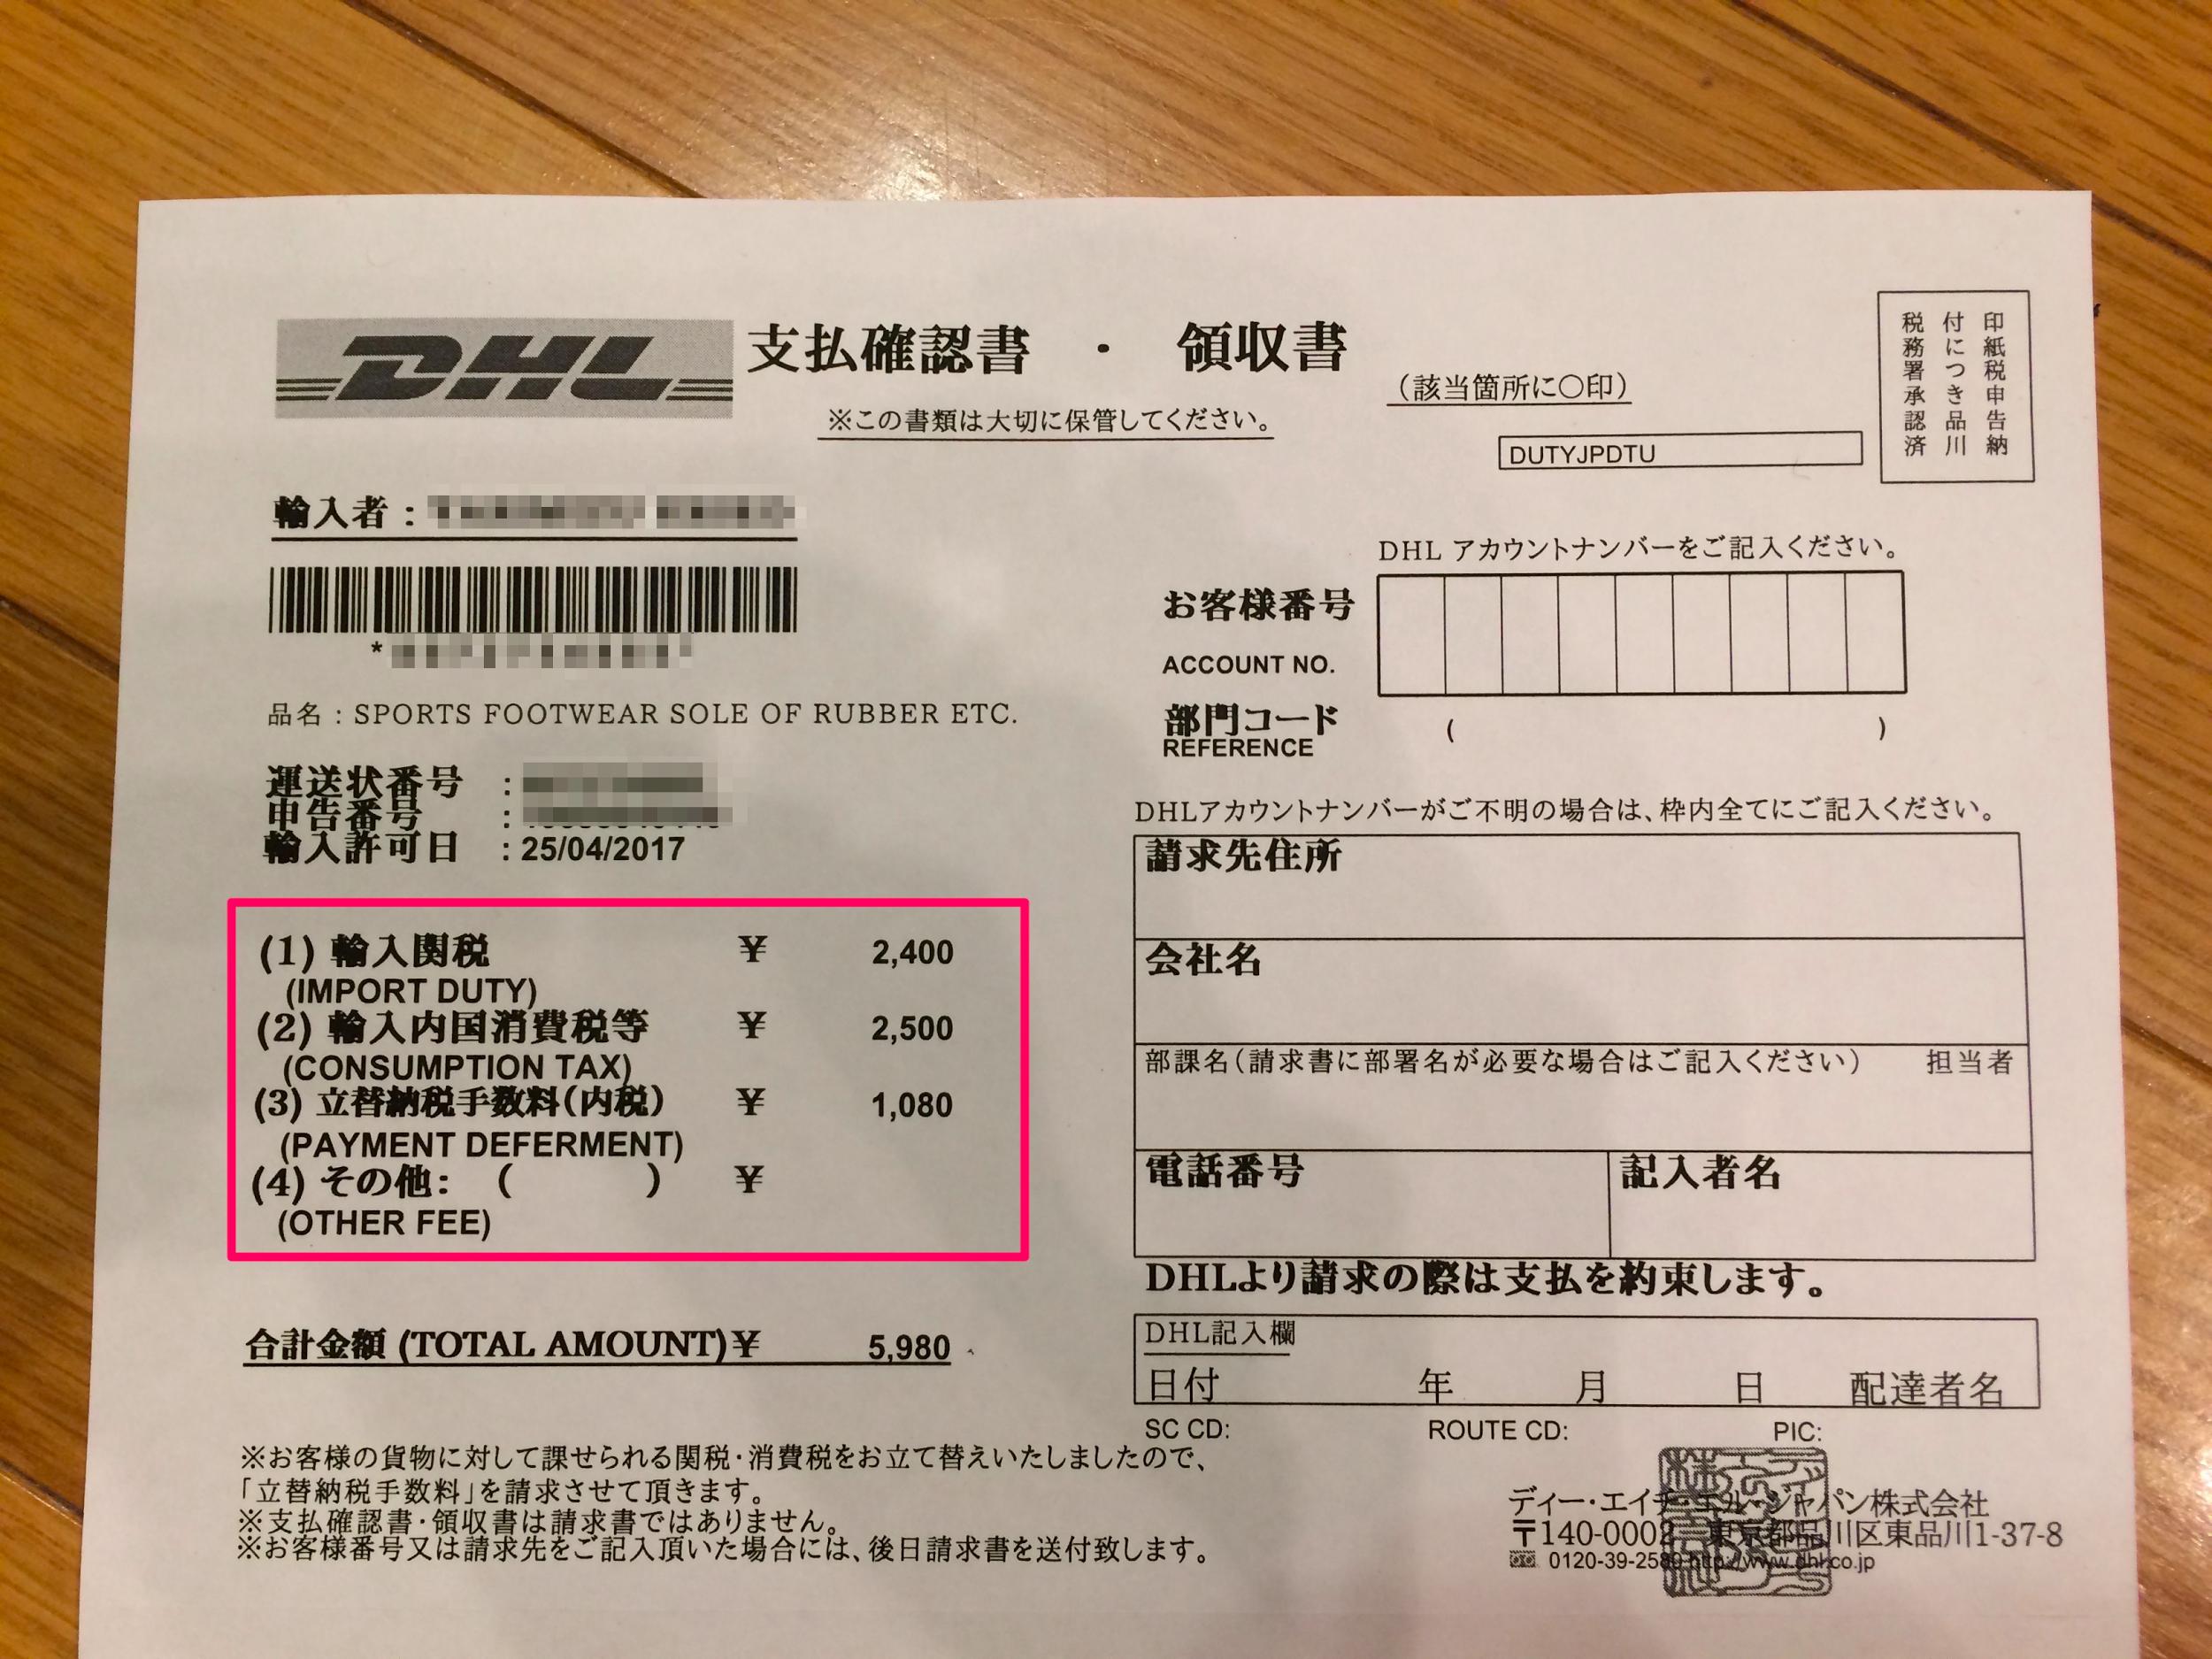 DHL領収書の関税、消費税箇所表示